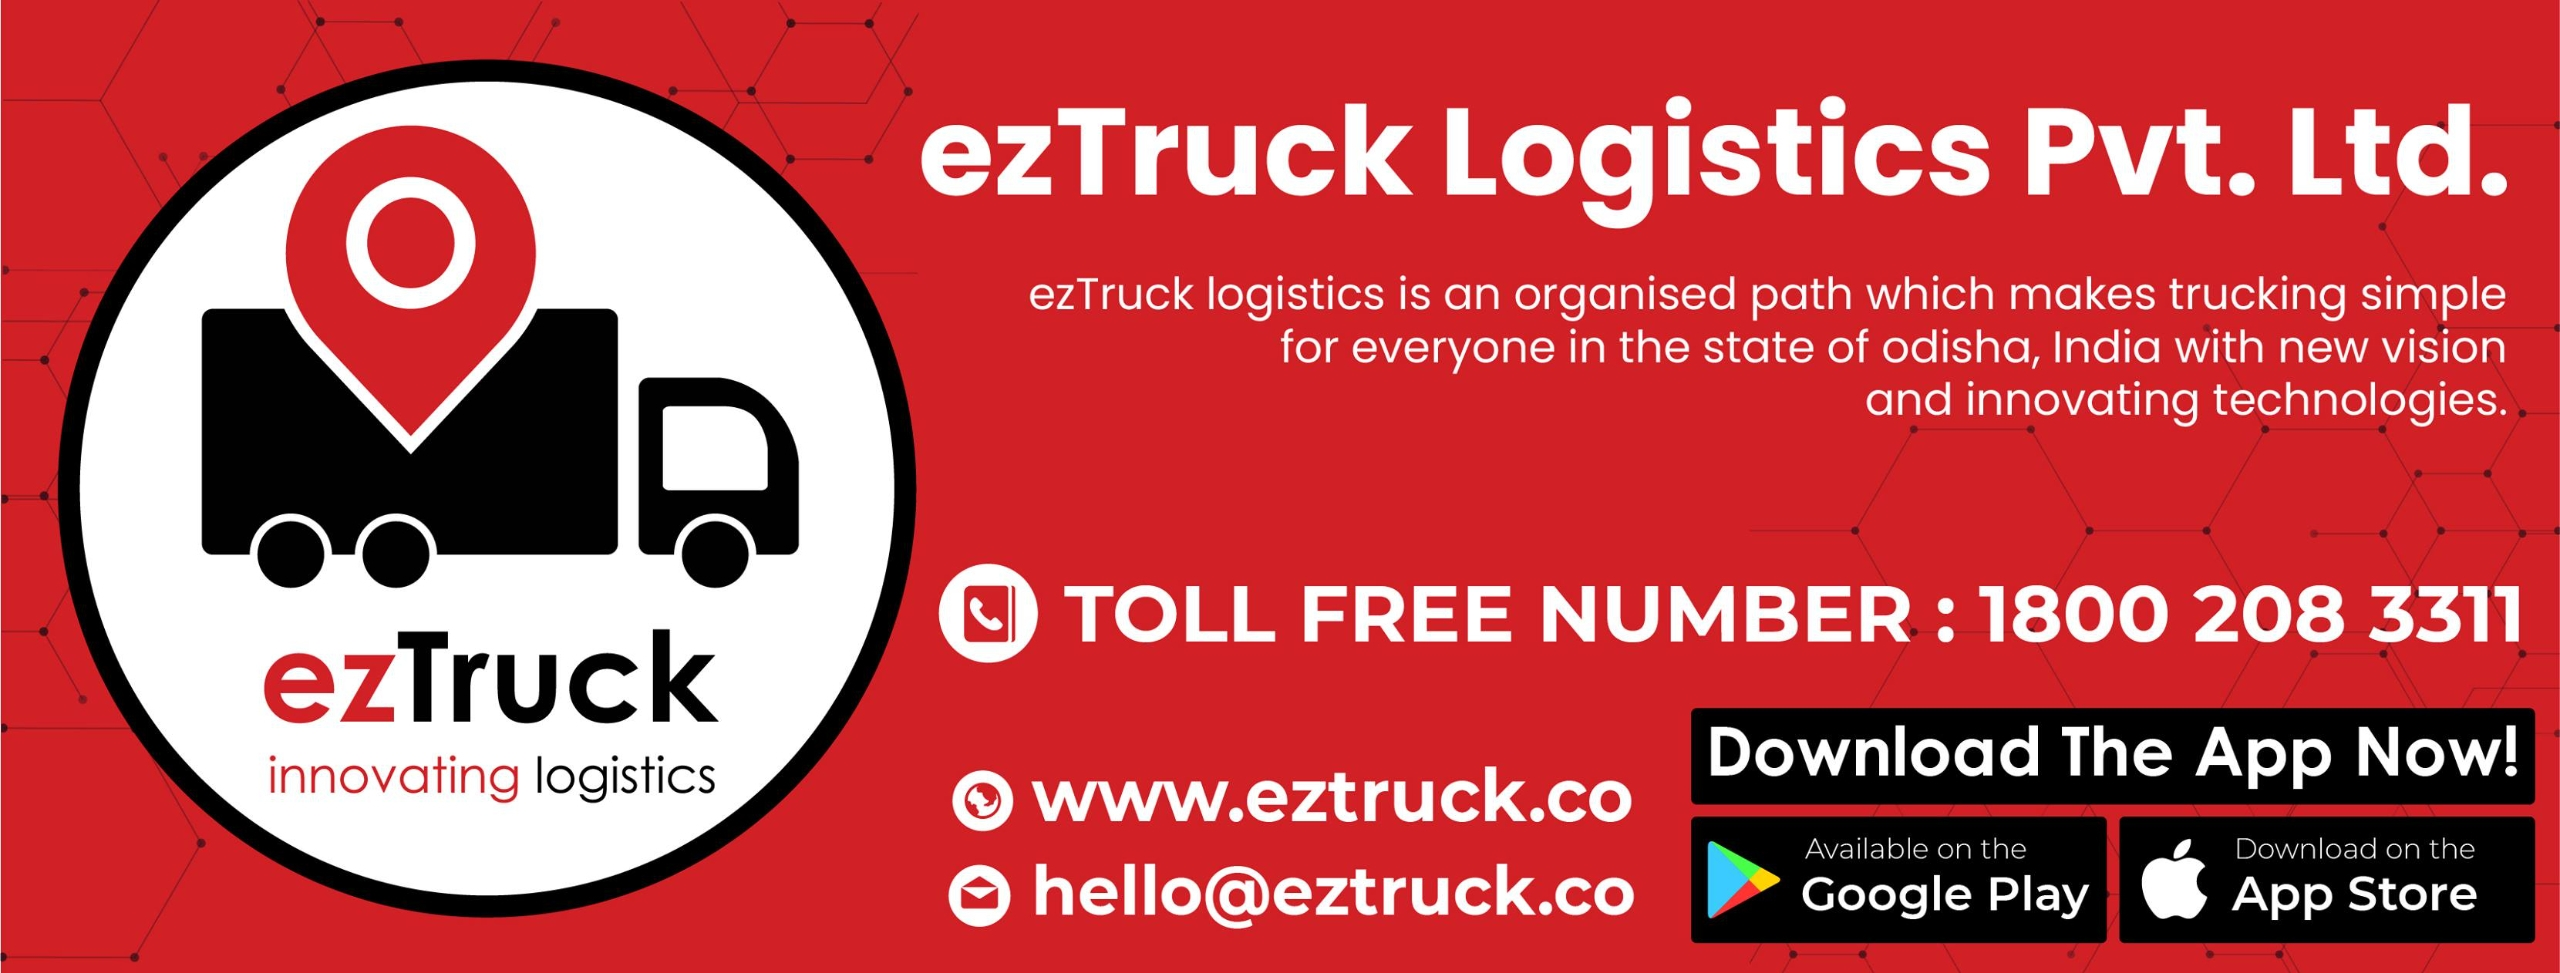 ezTruck Lo (@eztruck) Cover Image